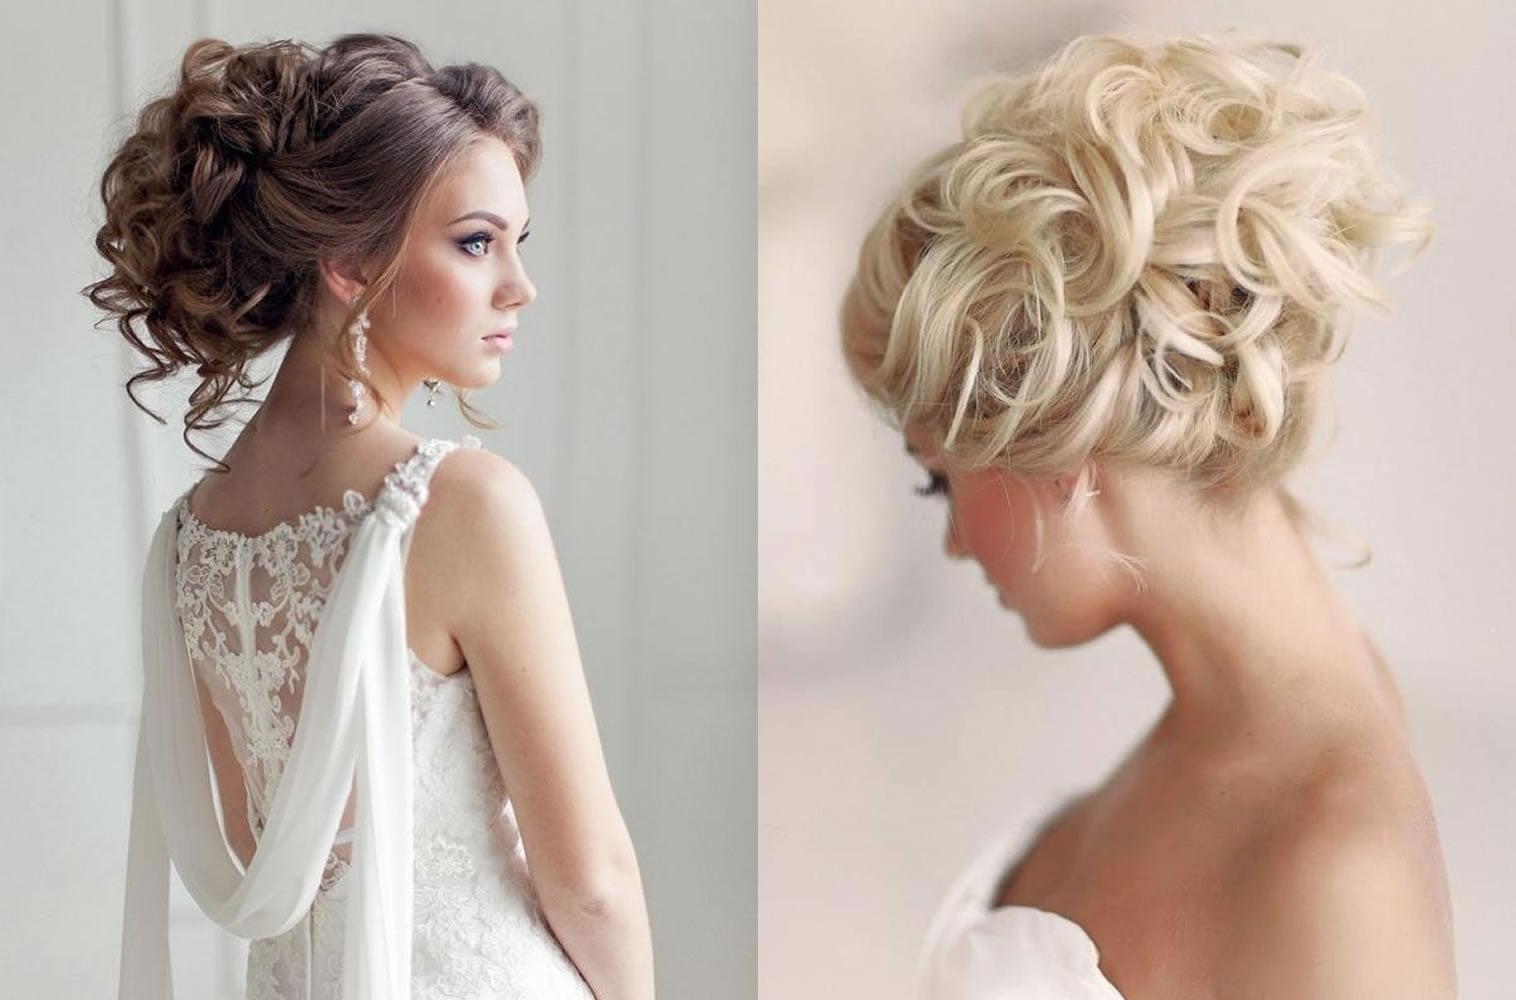 27 Gorgeous Wedding Hairstyles For Long Hair In 2019: Bridal Hair Designs 2019